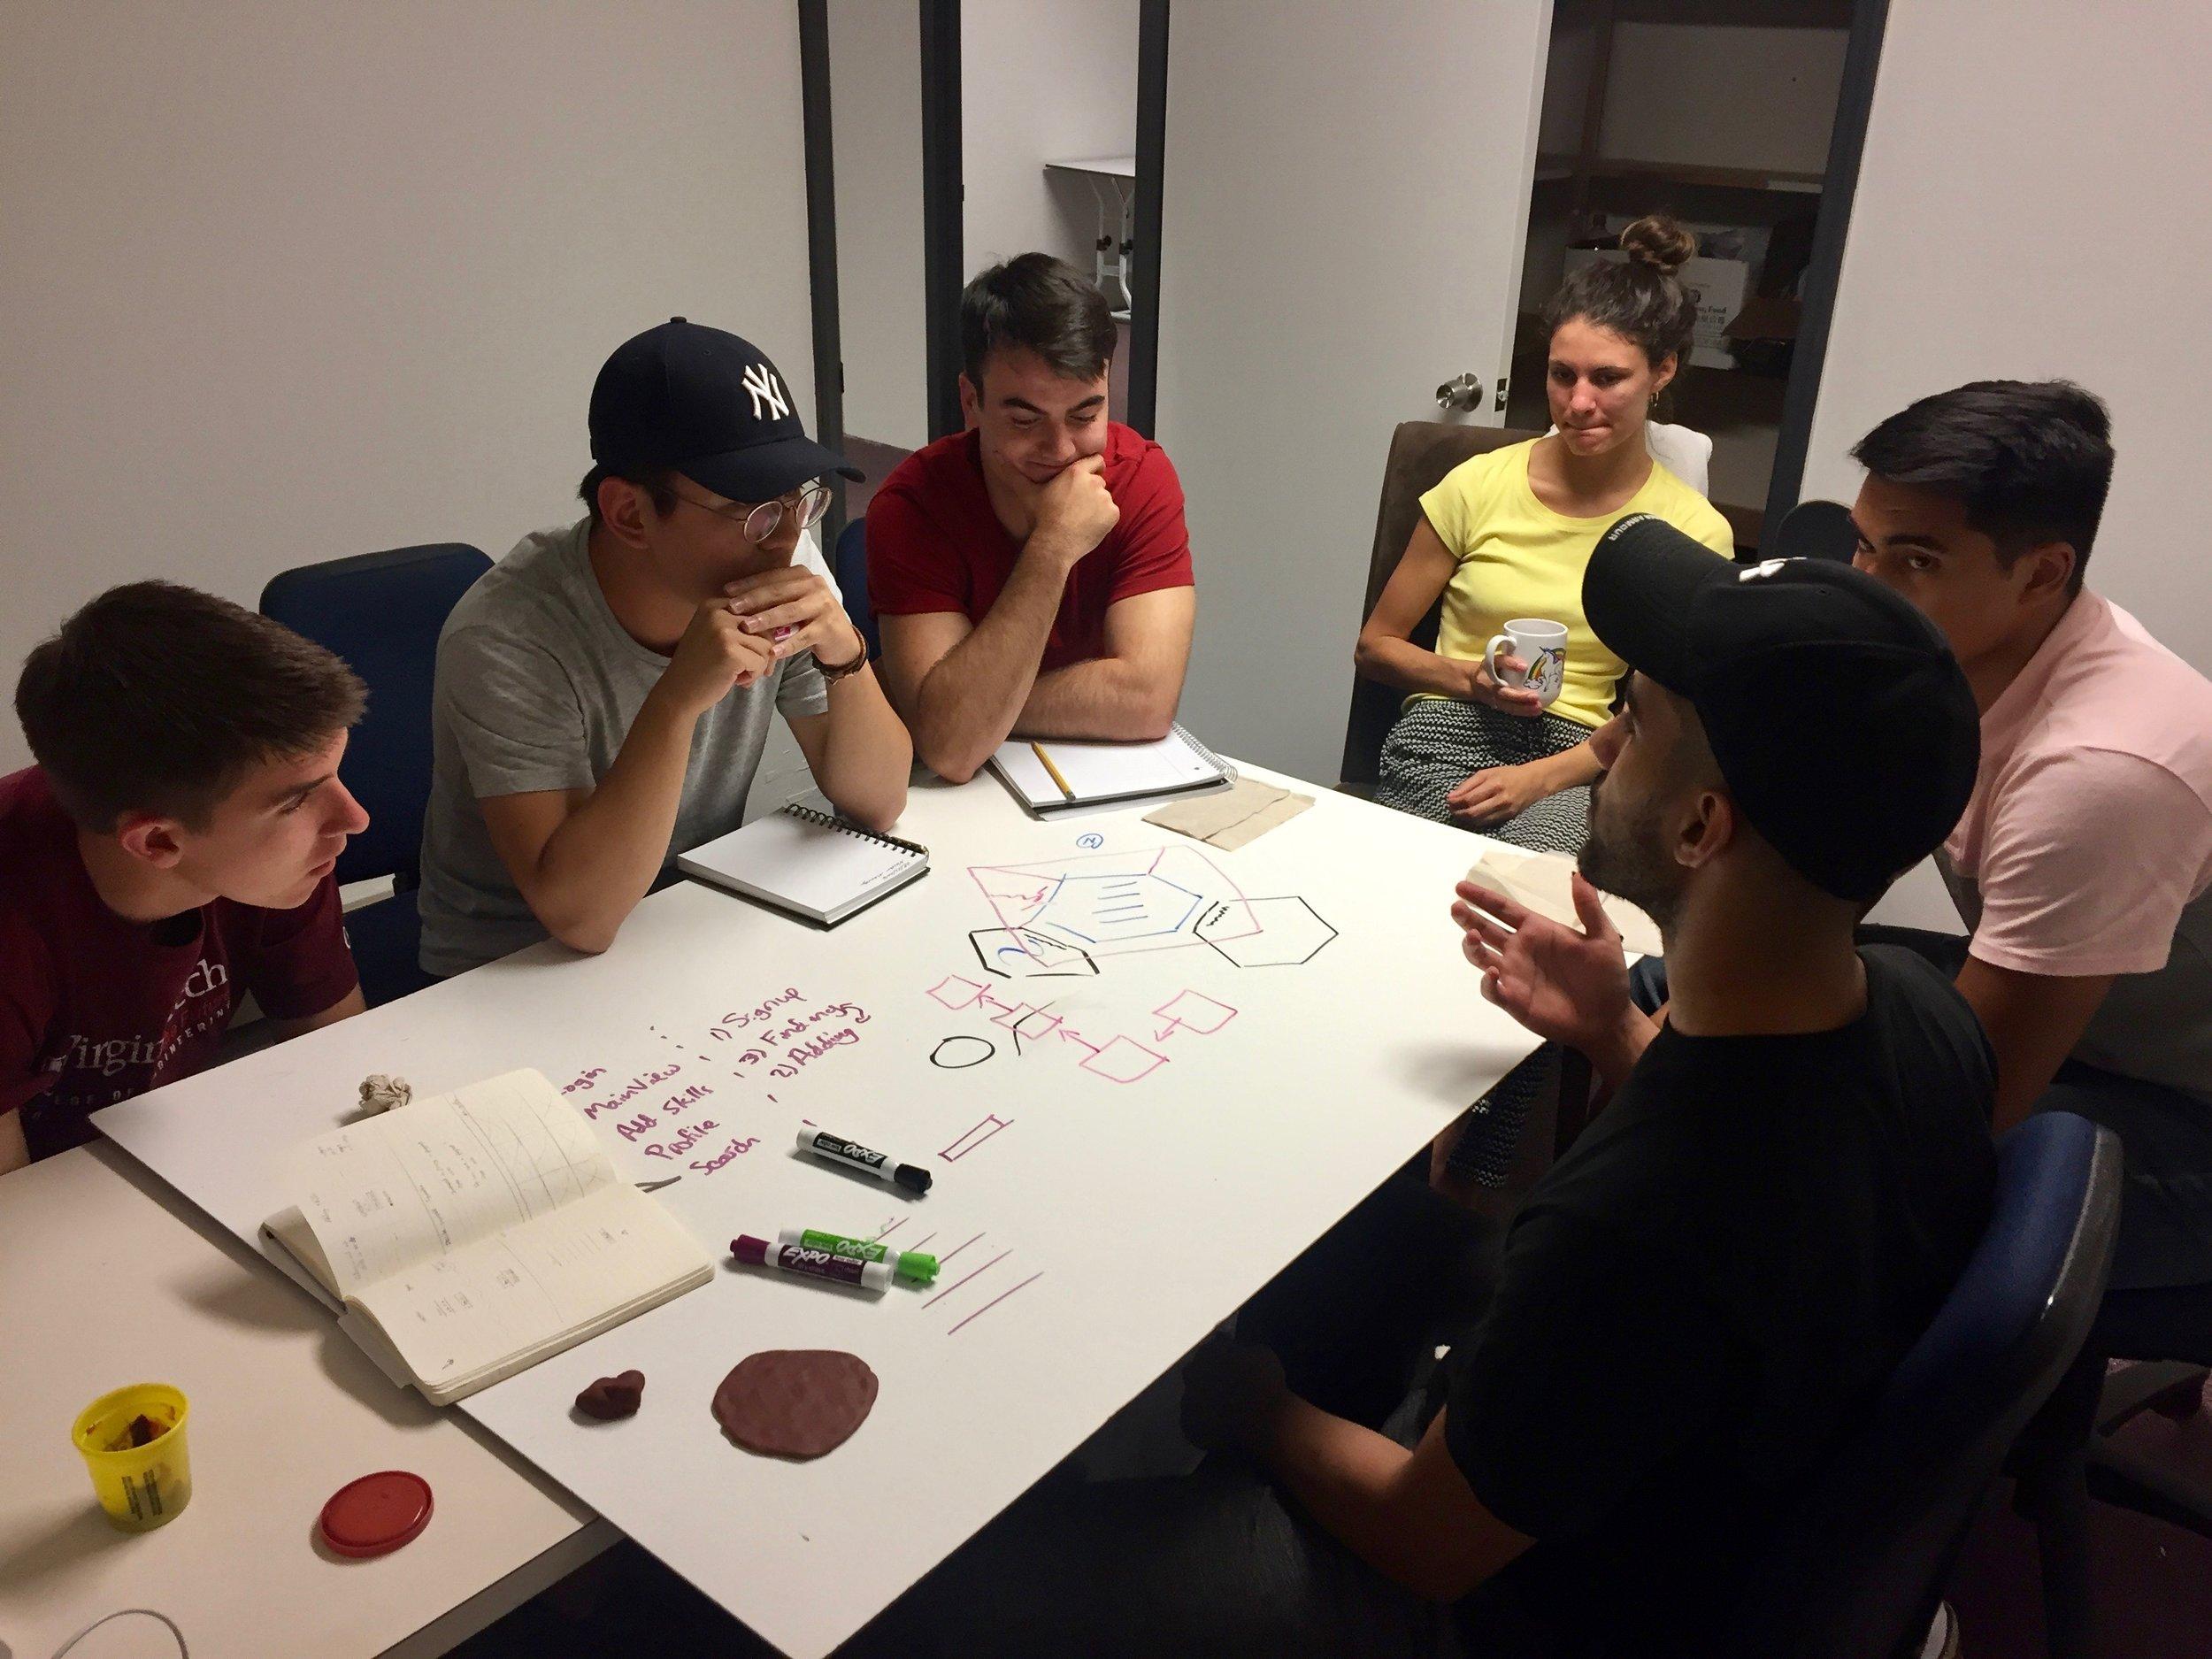 Nectar design and development team